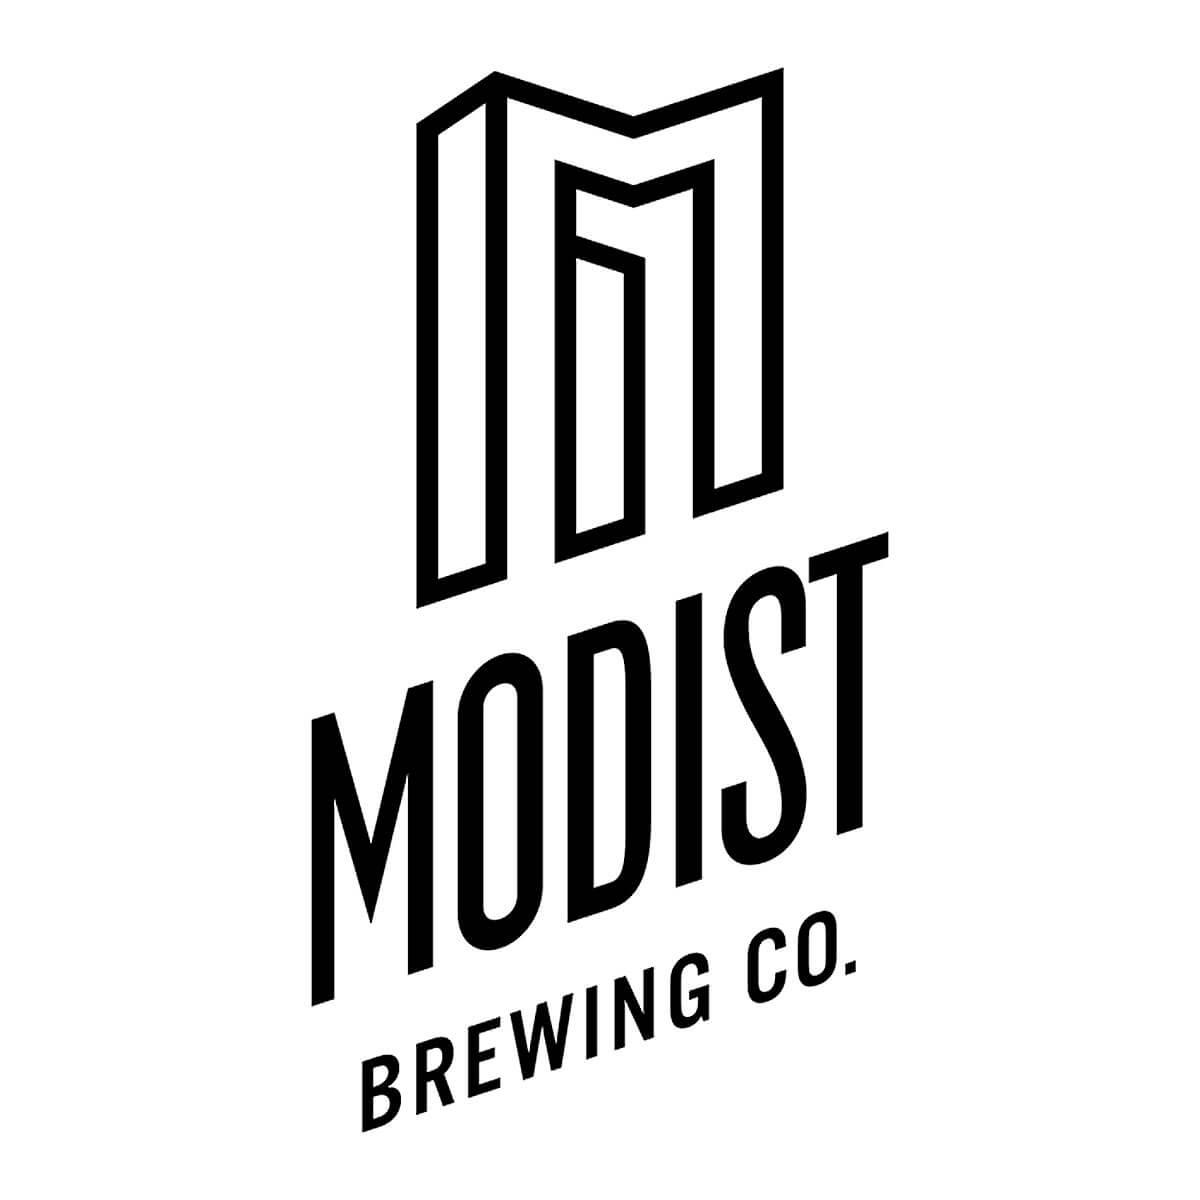 Modist Brewing Co. Logo